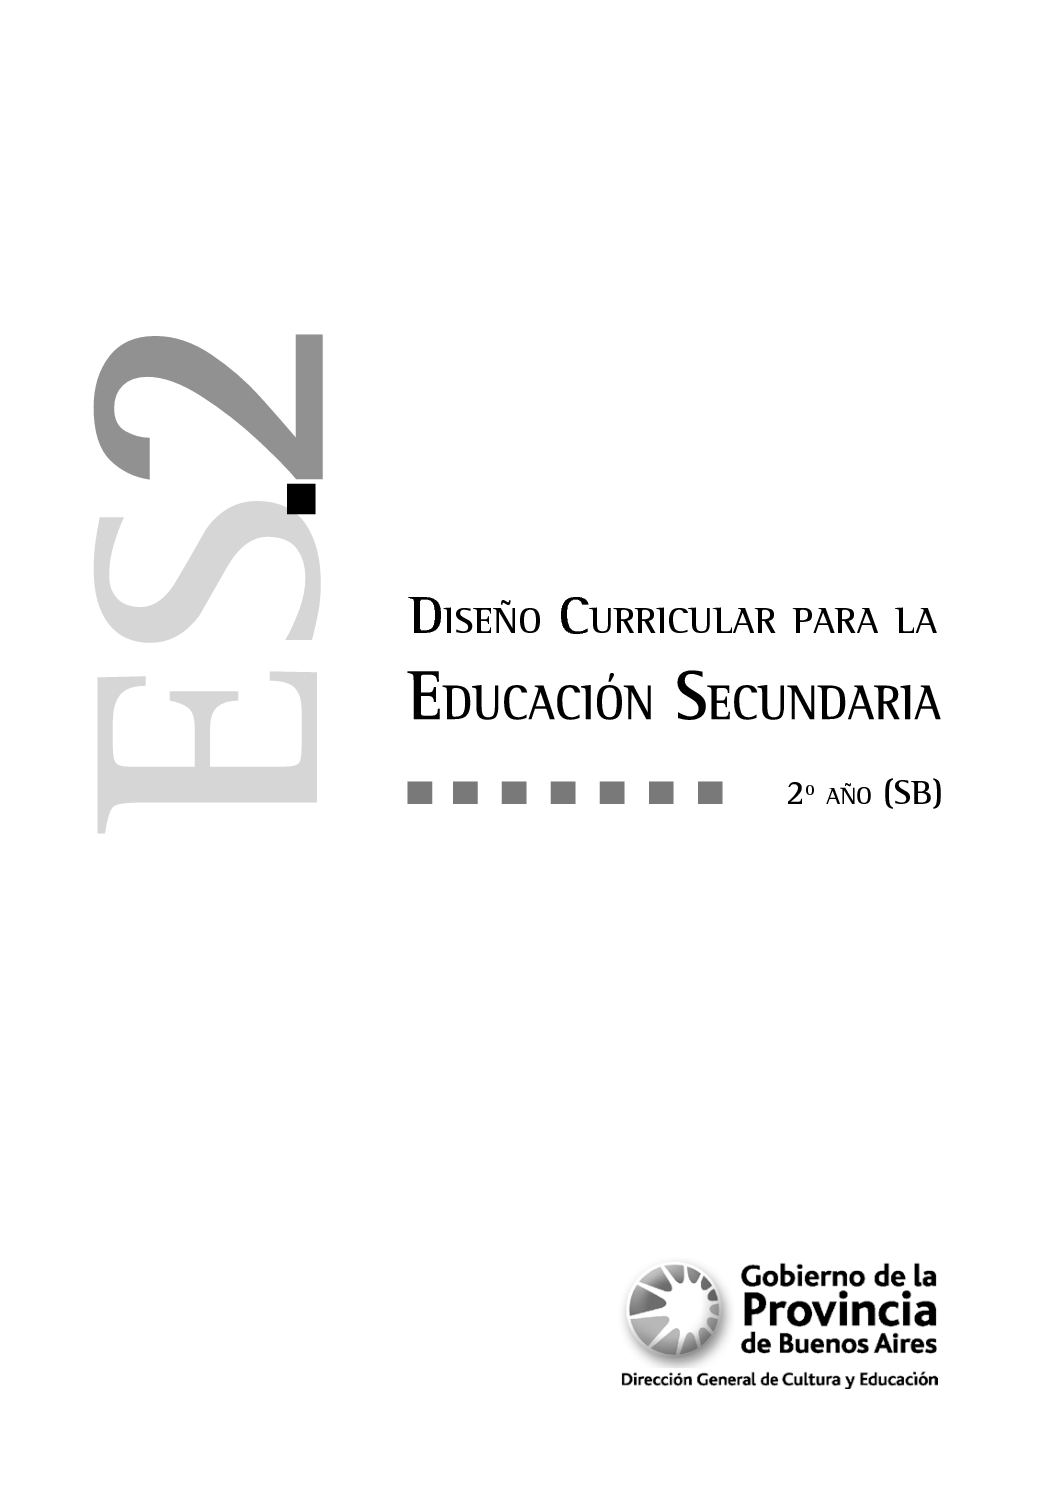 Calaméo - Diseño Curricular 2 SB